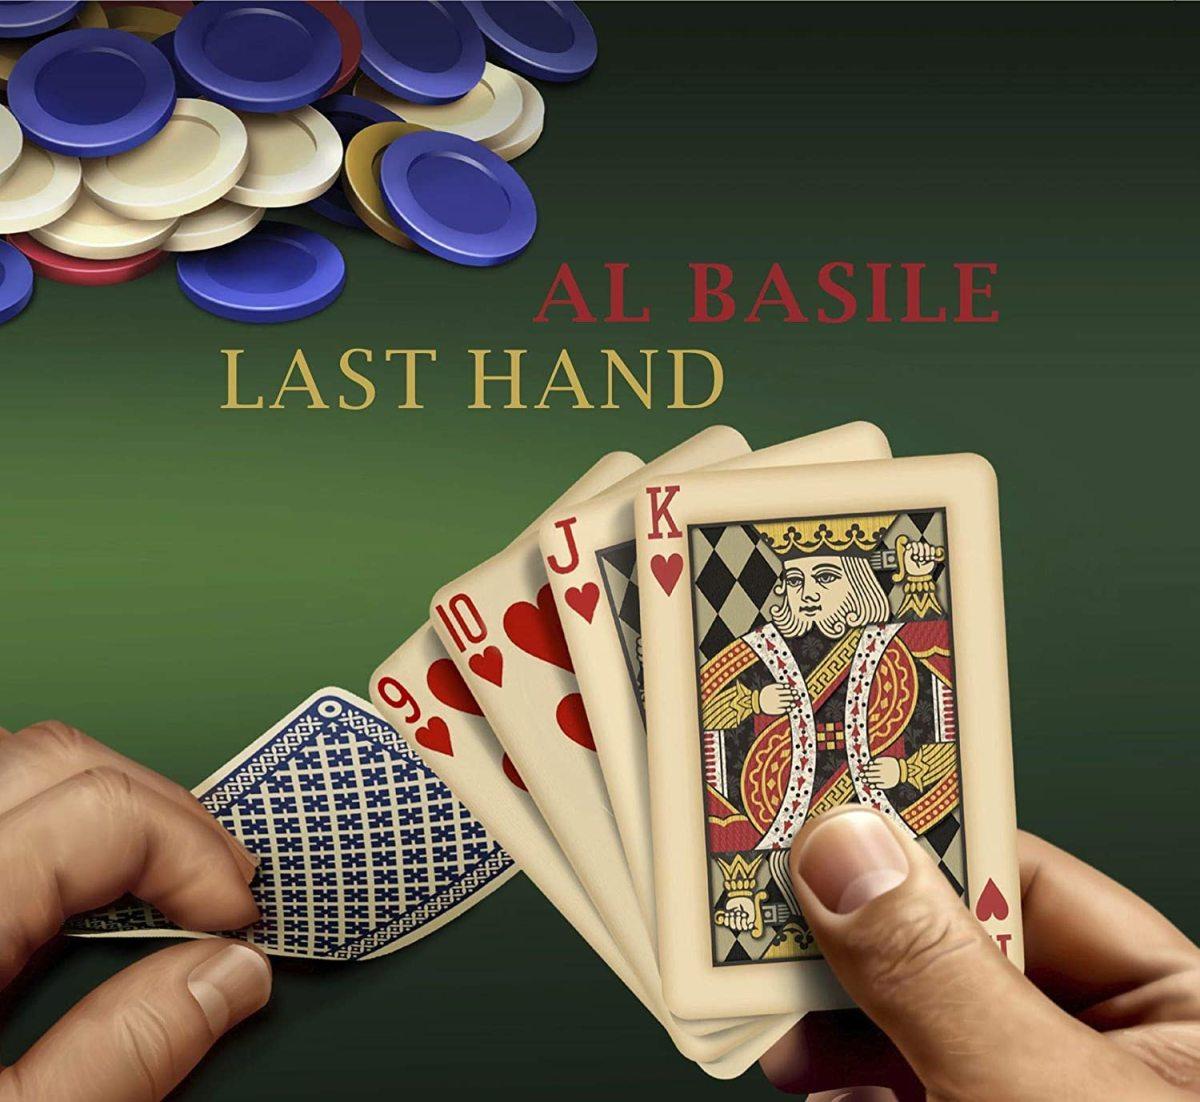 Al Basile